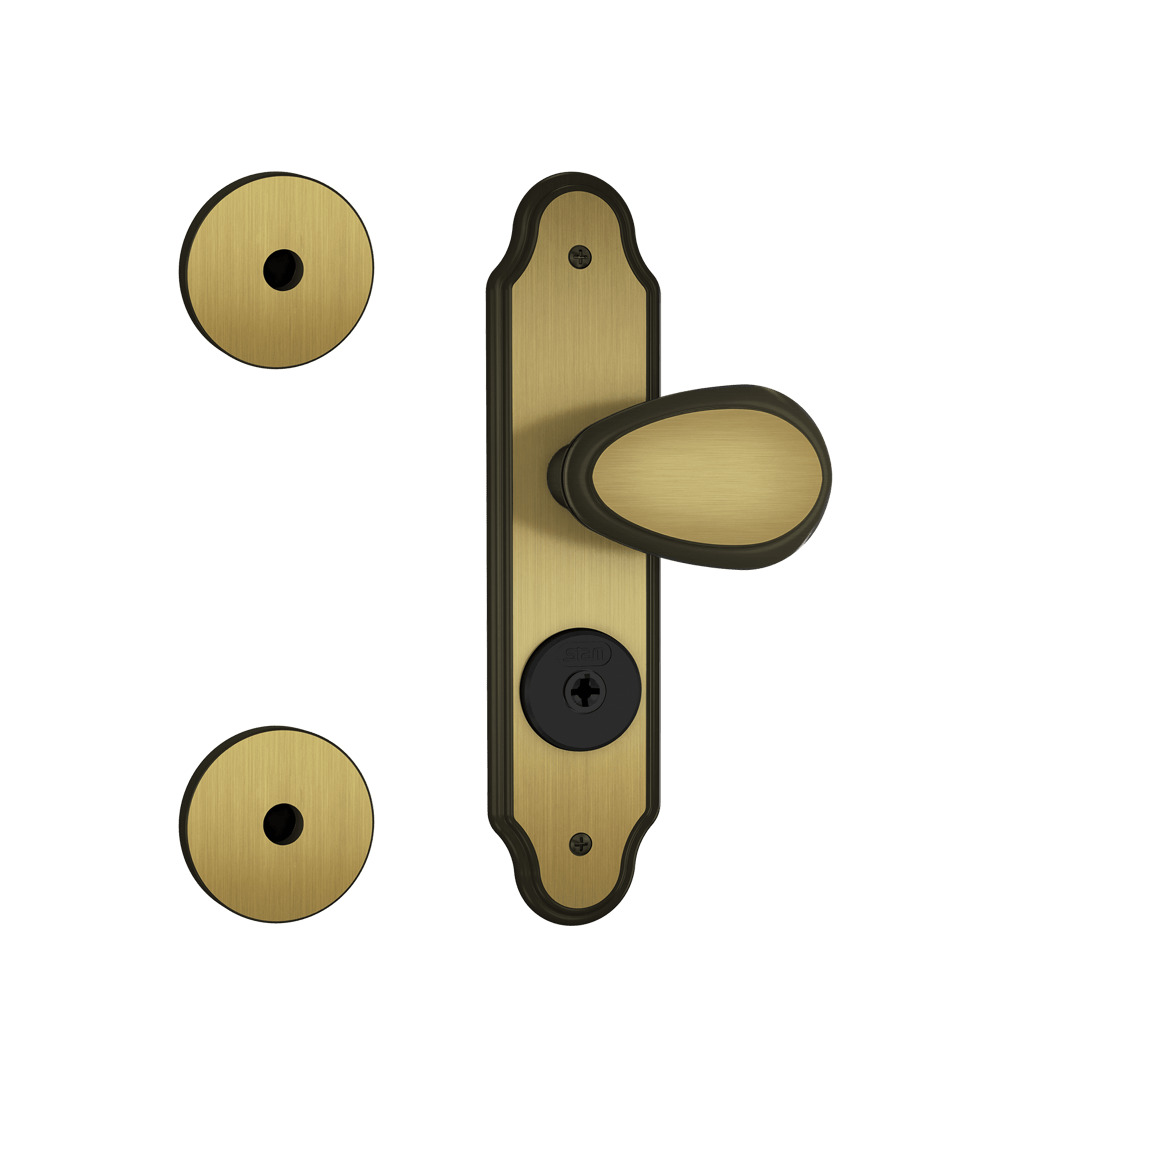 FECHADURA STAM TACO GOLF KIT 3X1 – 1083/10 – COD: 18703